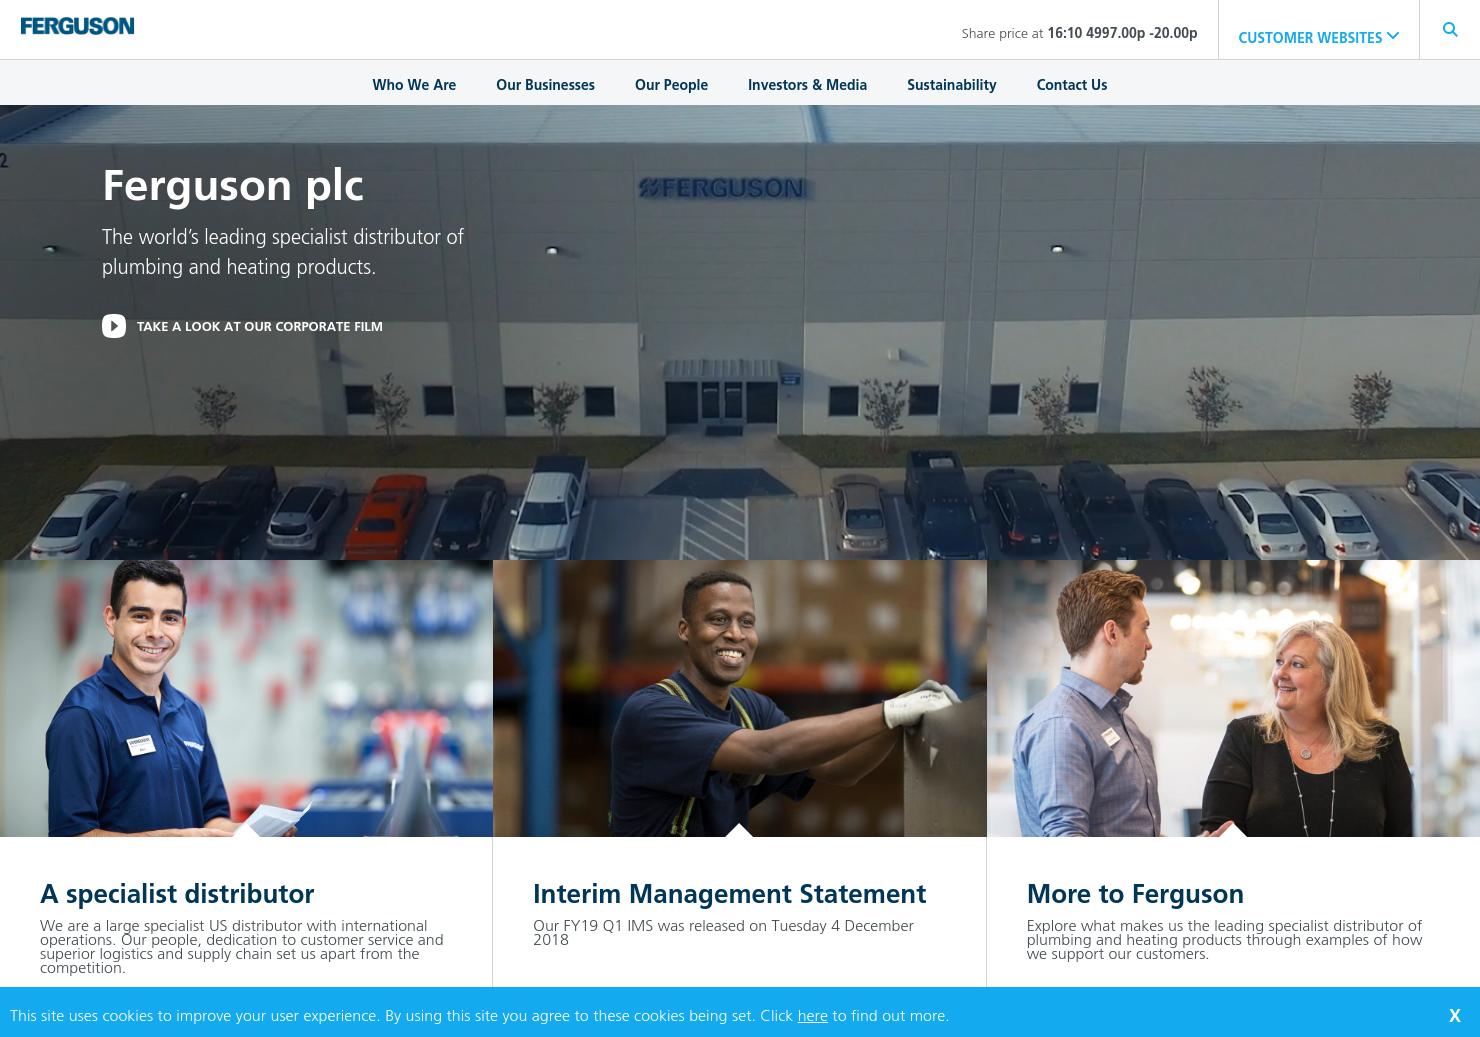 Ferguson Home Page